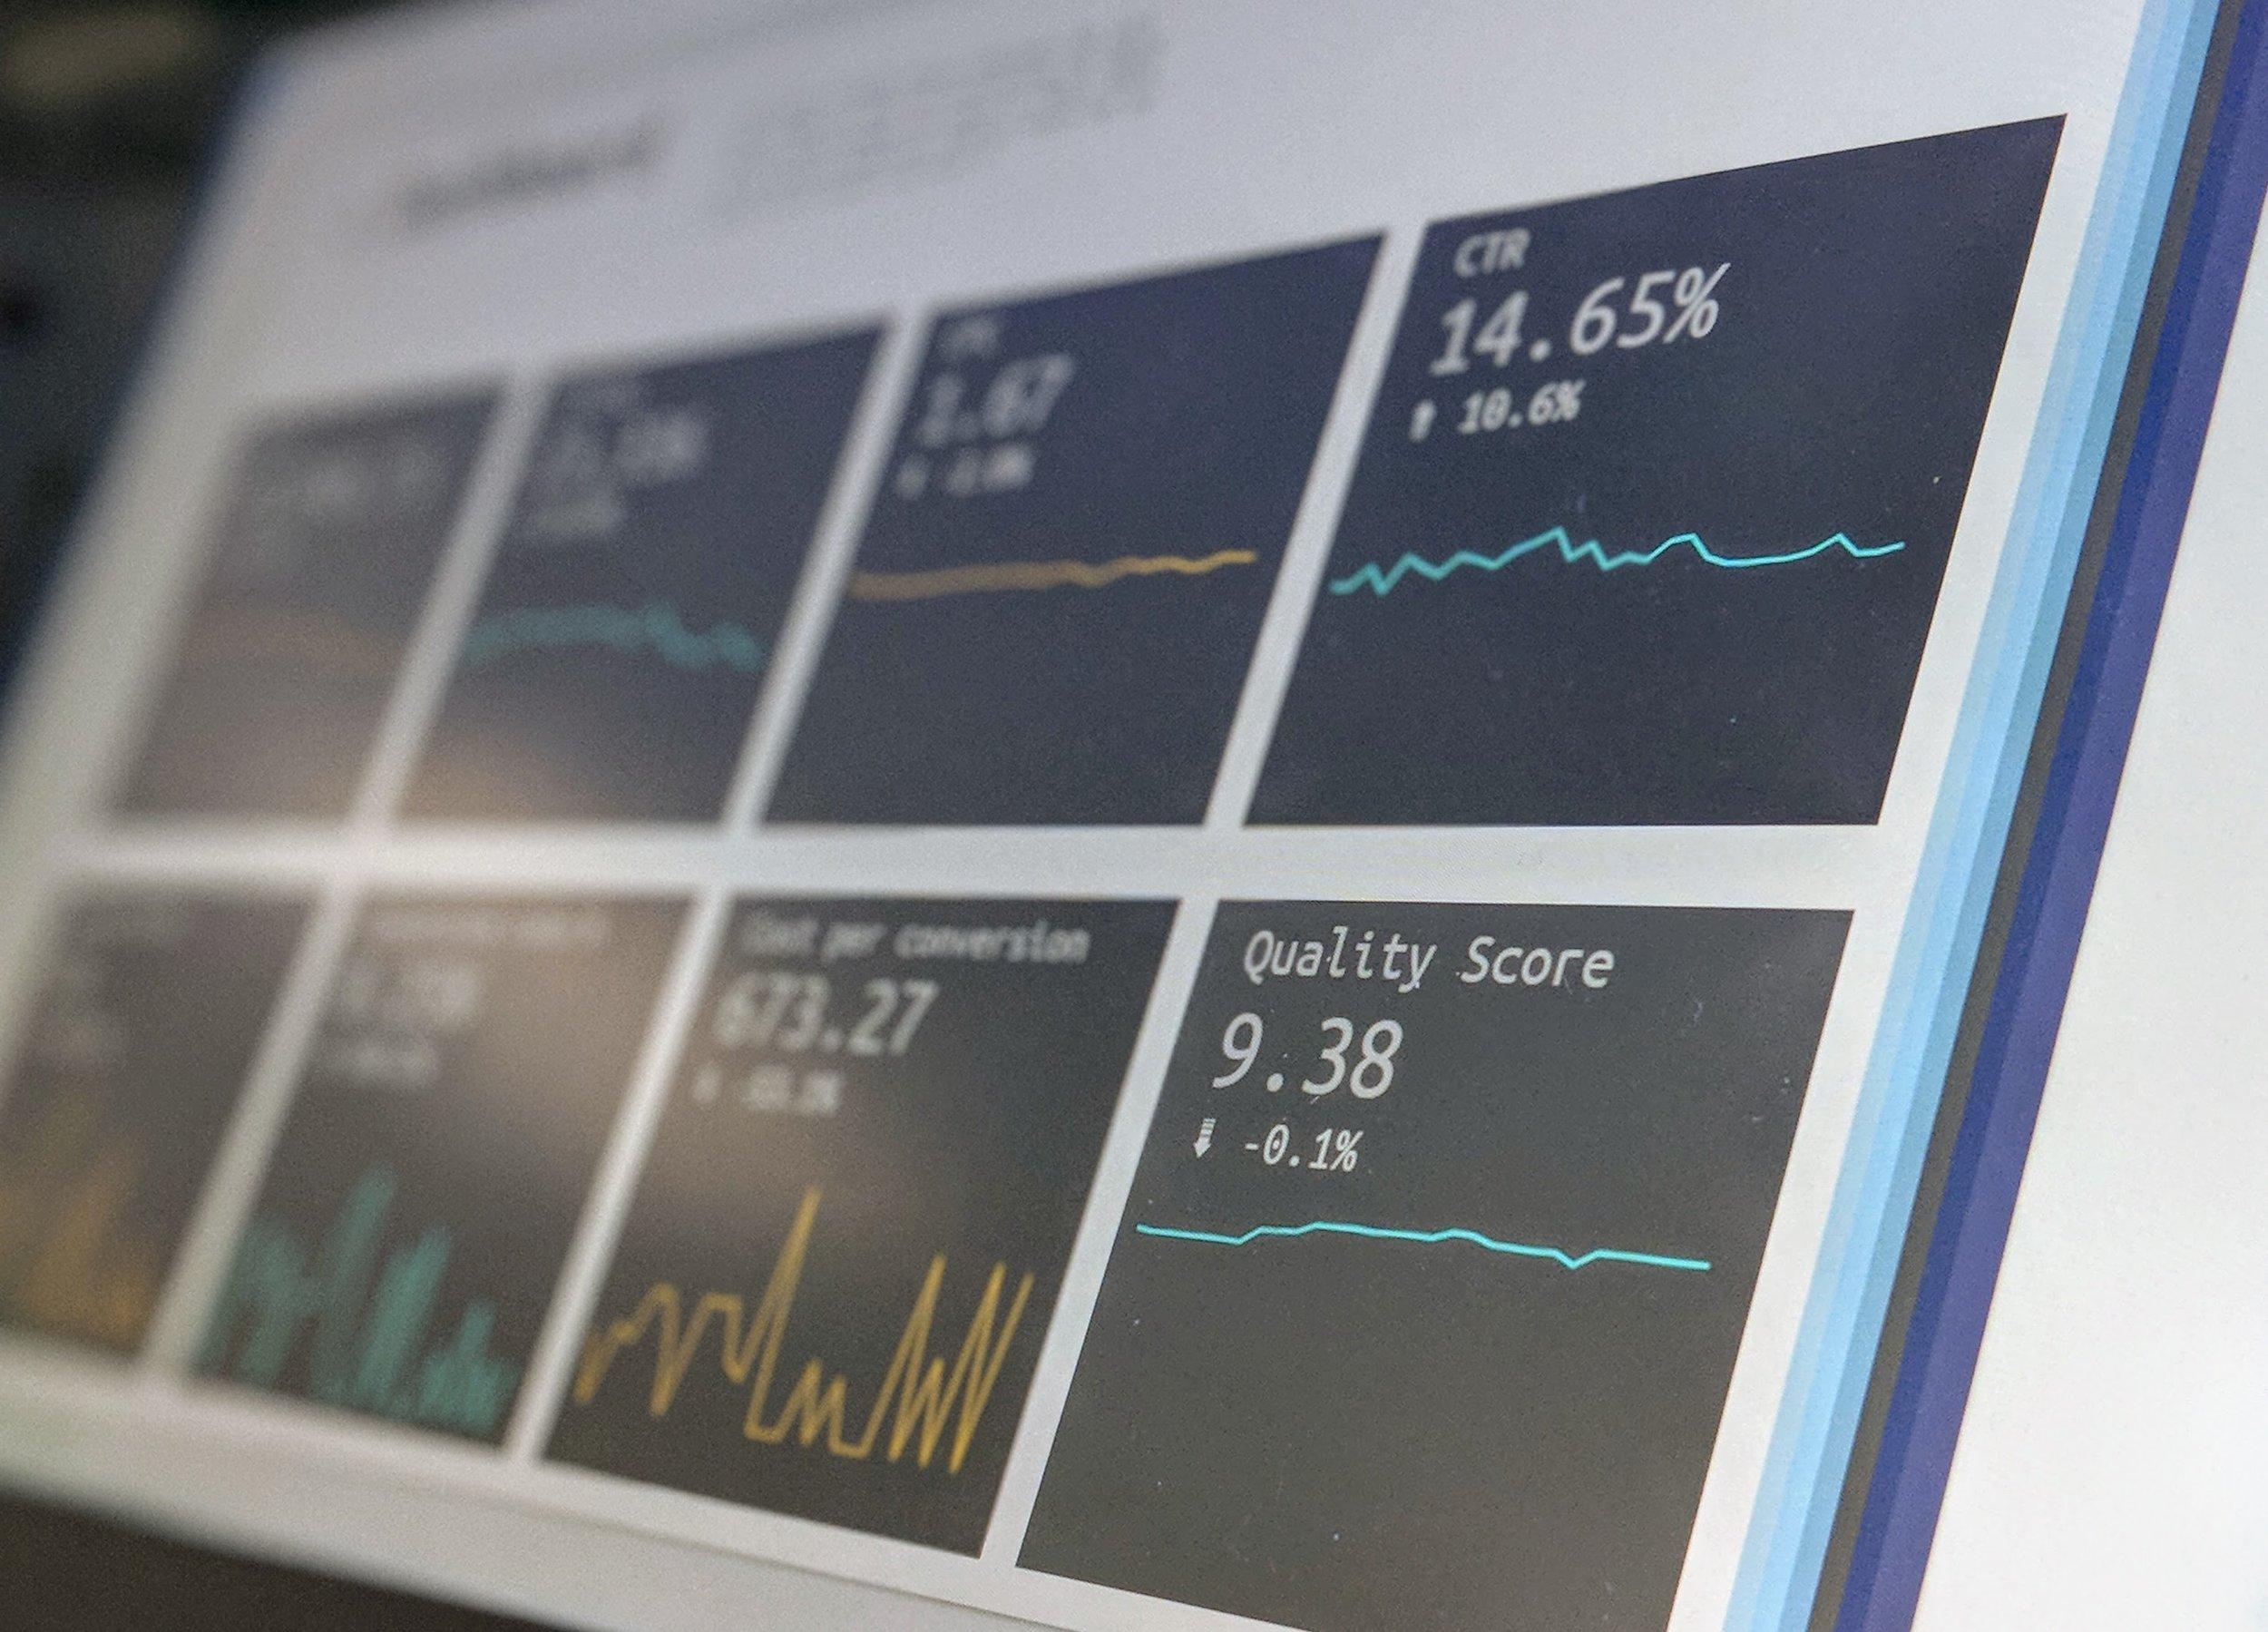 ☵ Analytics - Website AnalyticsCampaign TrackingCross-Channel AttributionAudience SegmentationSpend Optimization